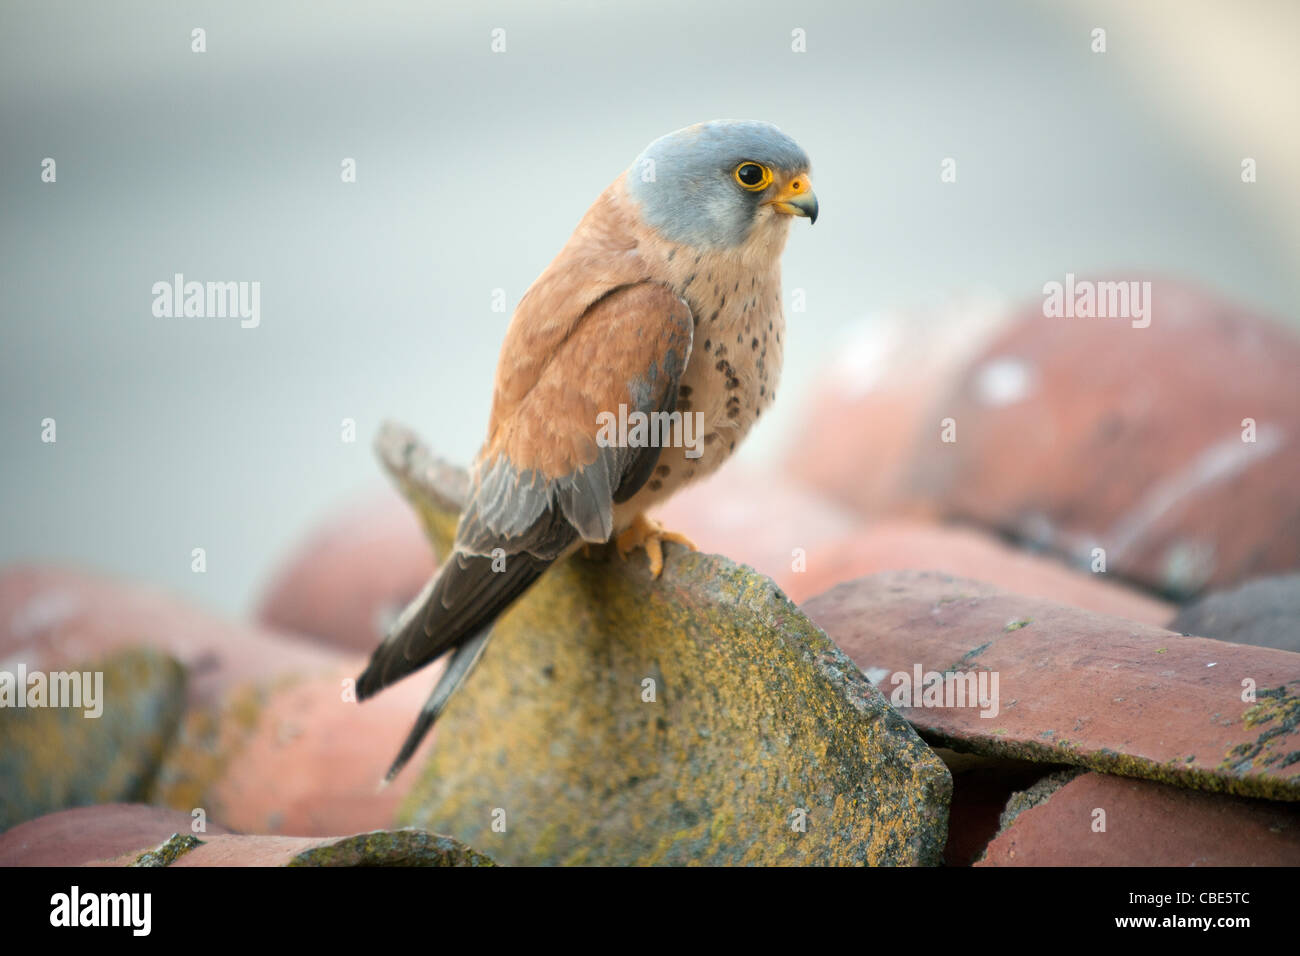 Lesser Kestrel (Falco naumanni), male perched on roof, Spain - Stock Image